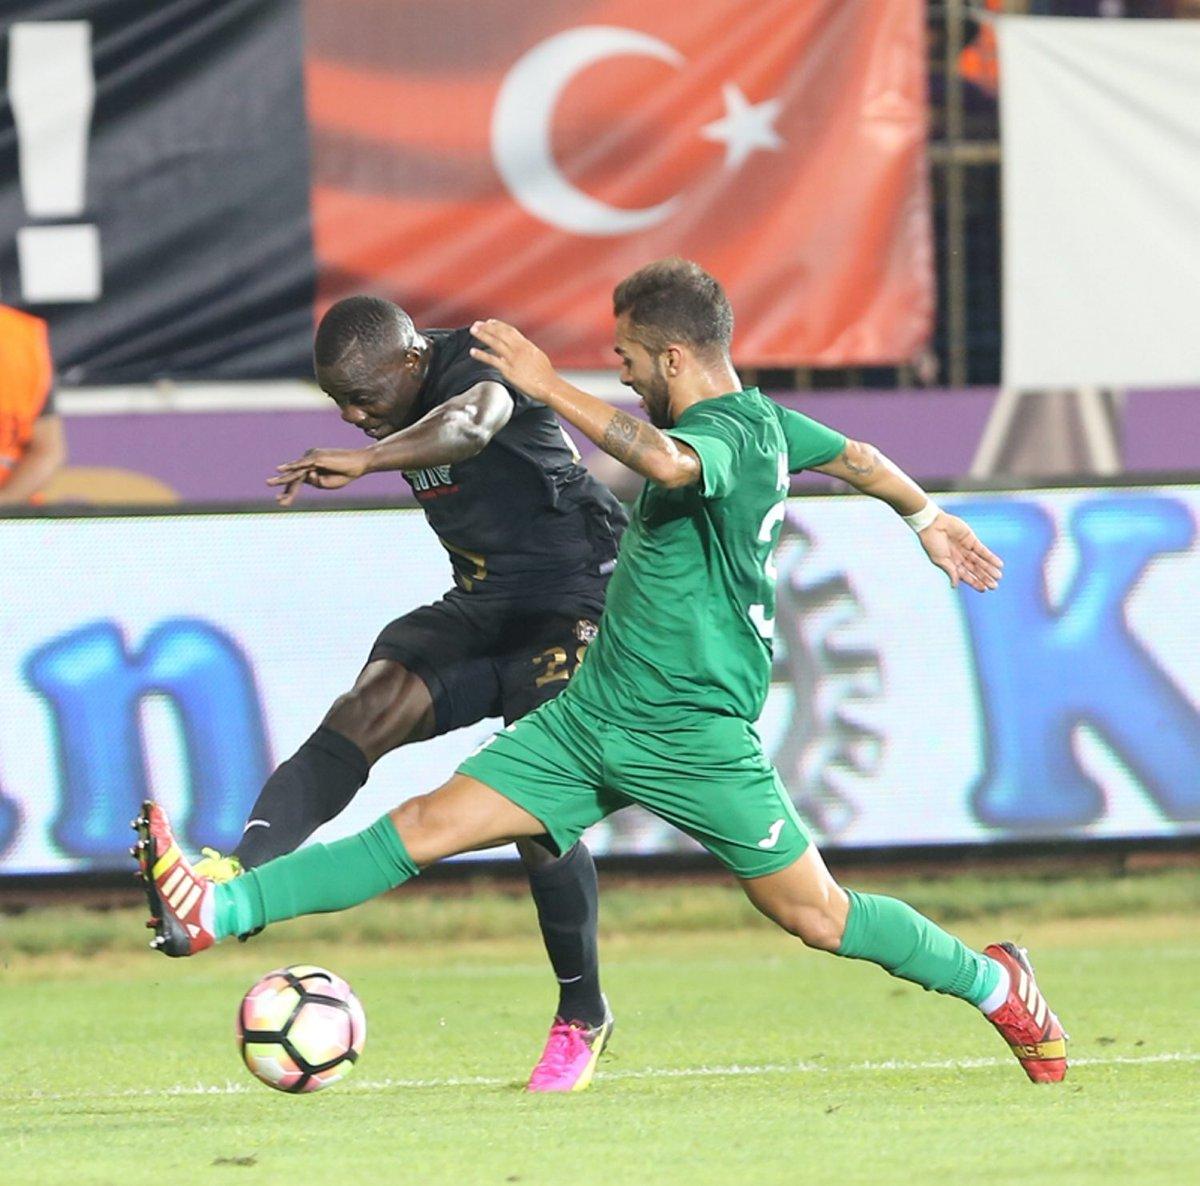 Europa: Umar Bags Hat-trick In Osmanslipor Rout; Oduamadi, Taiwo Win